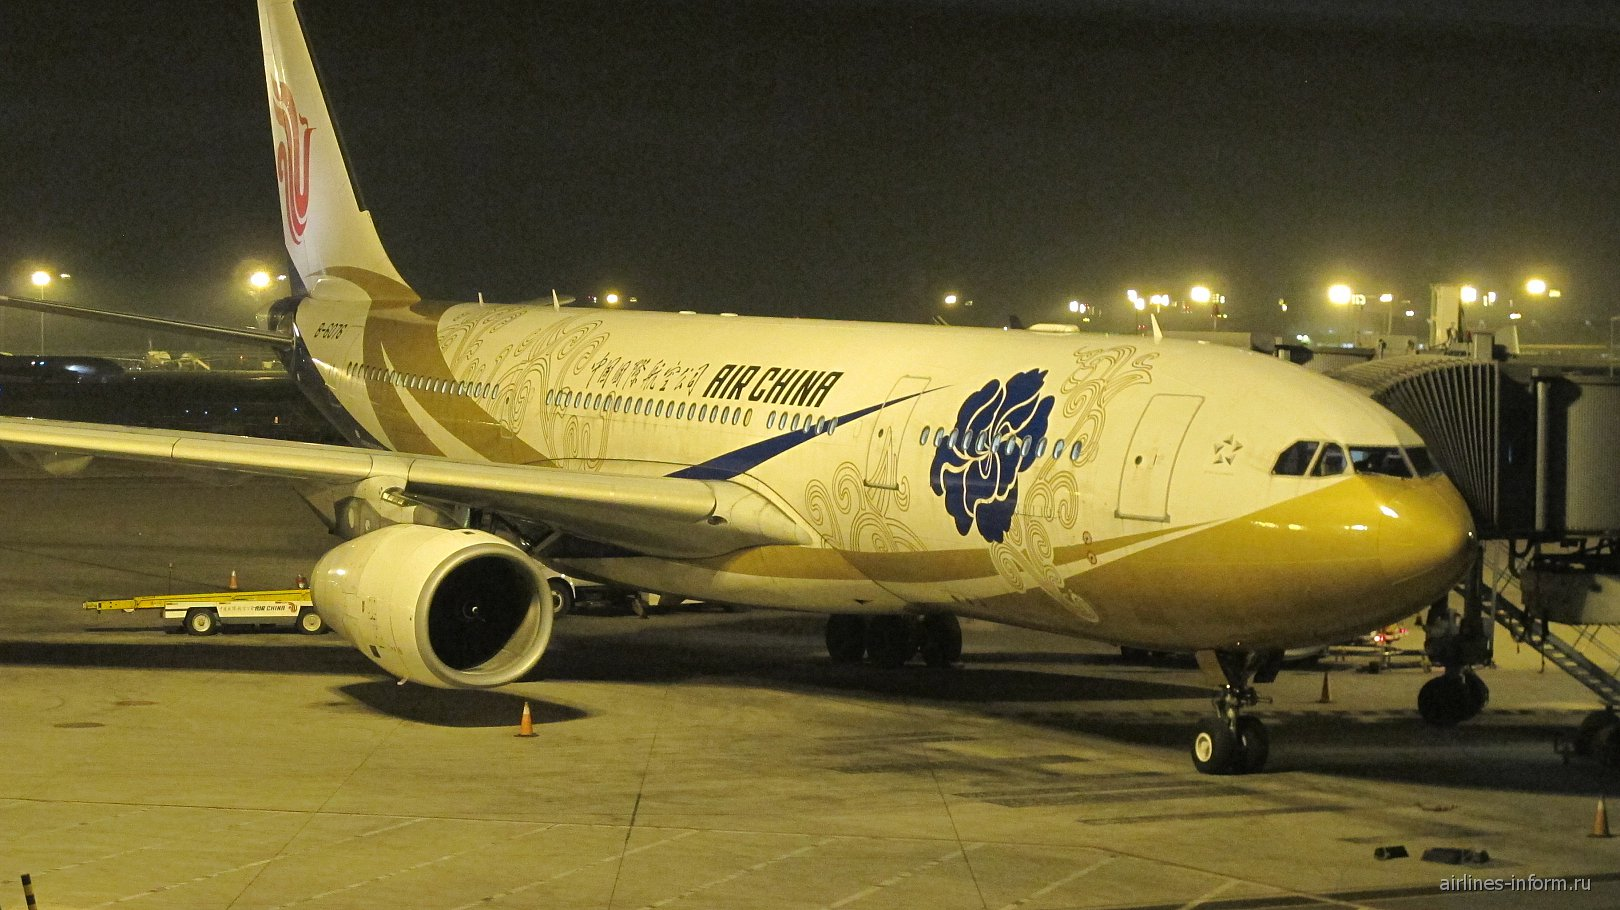 Airbus A330-200 авиакомпании Air China в аэропорту Пекин Столичный